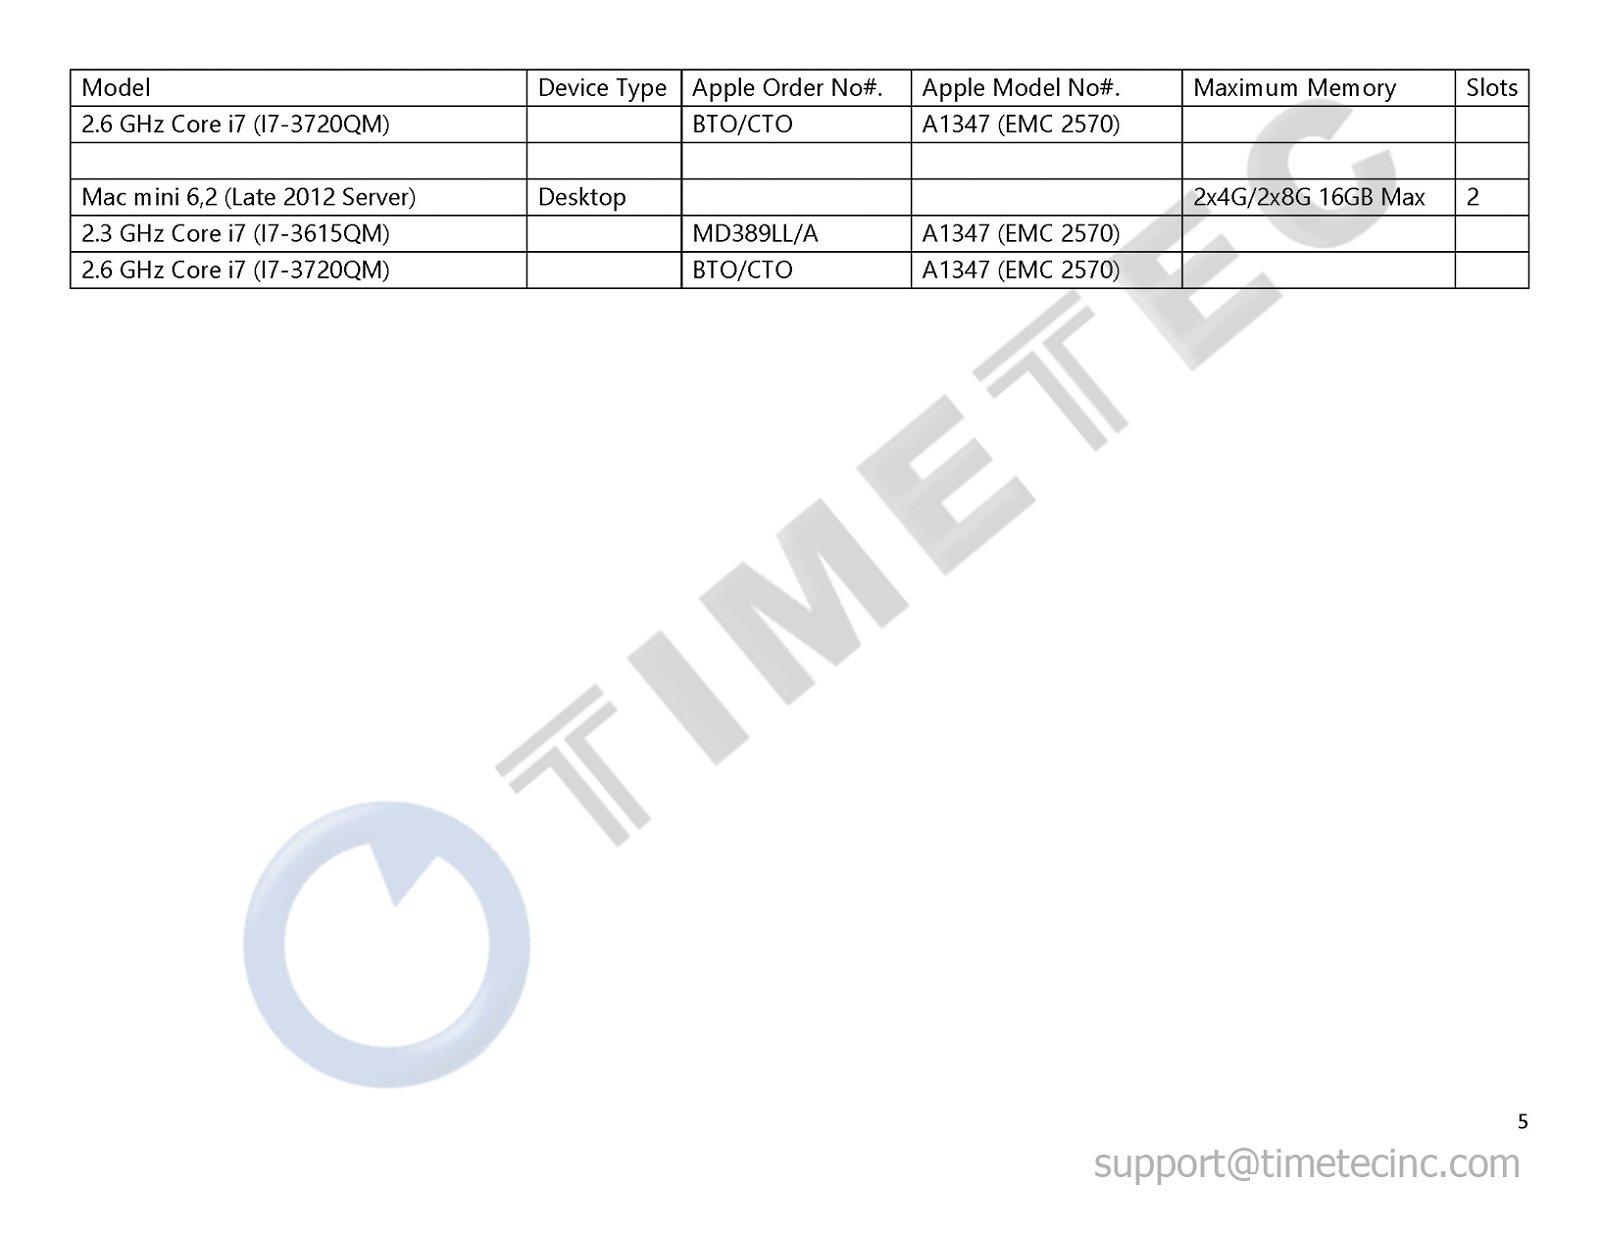 Timetec Hynix IC Apple 16GB Kit (2x8GB) DDR3L 1600MHz PC3L-12800 SODIMM Memory upgrade For MacBook Pro13-inch/15-inch Mid 2012, iMac 21.5-inch Late 2012/ Early/Late 2013(16GB Kit (2x8GB)) by Timetec (Image #6)